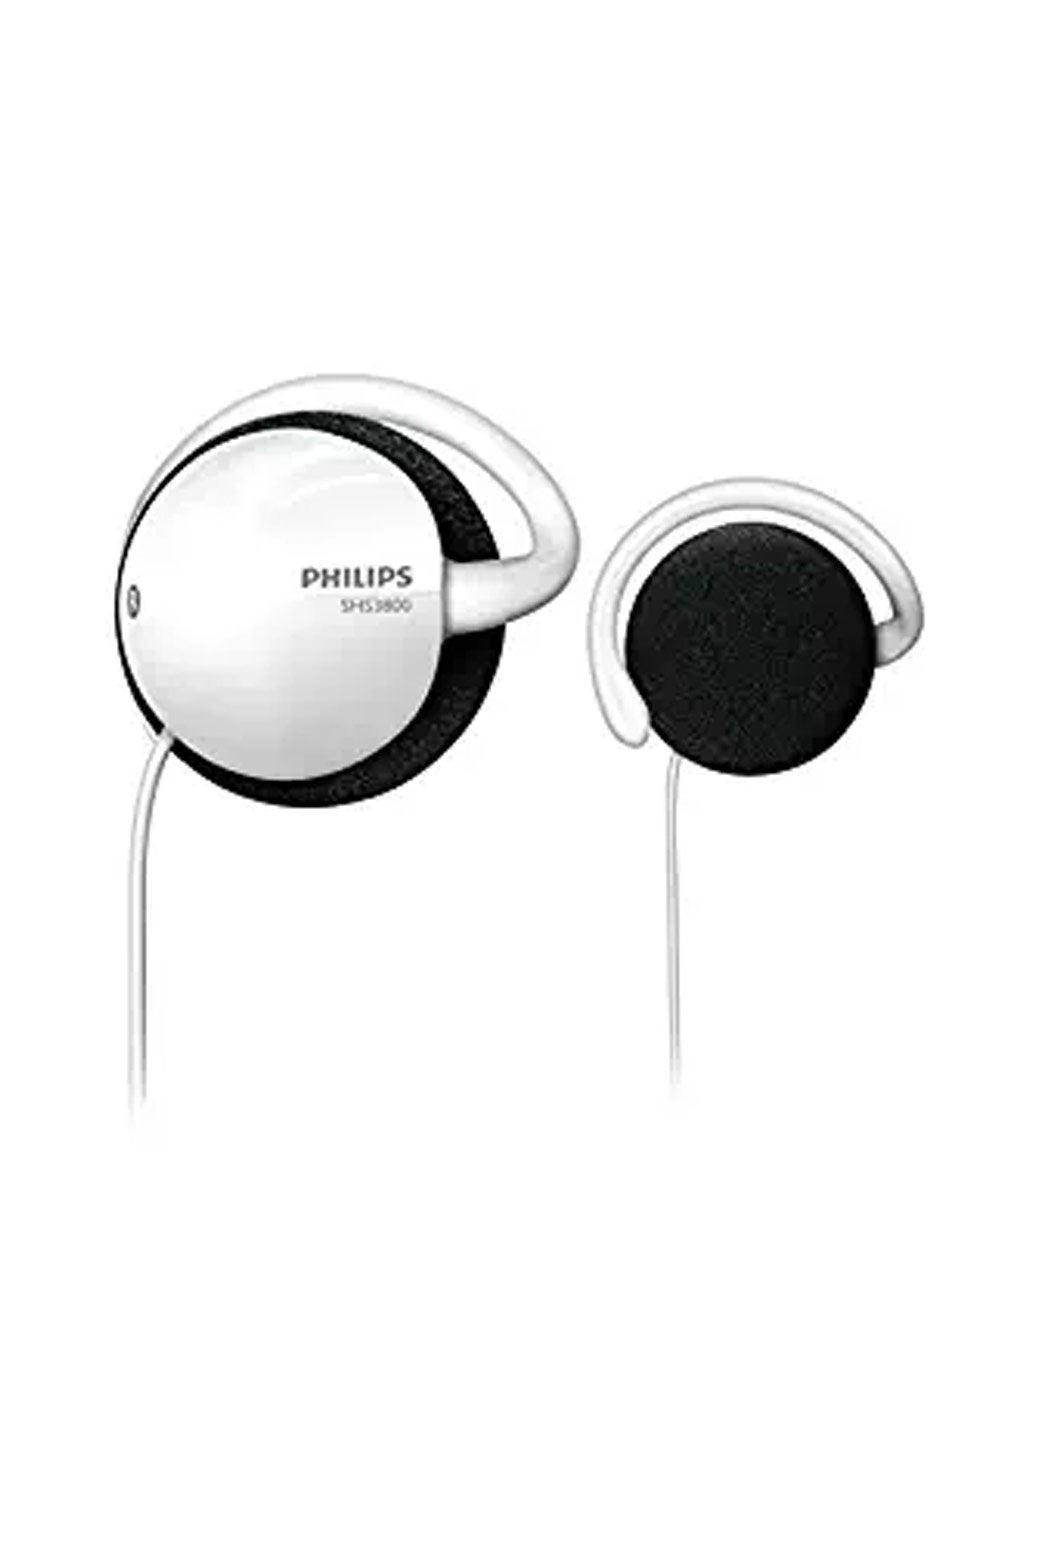 Philips ear-clip headphones